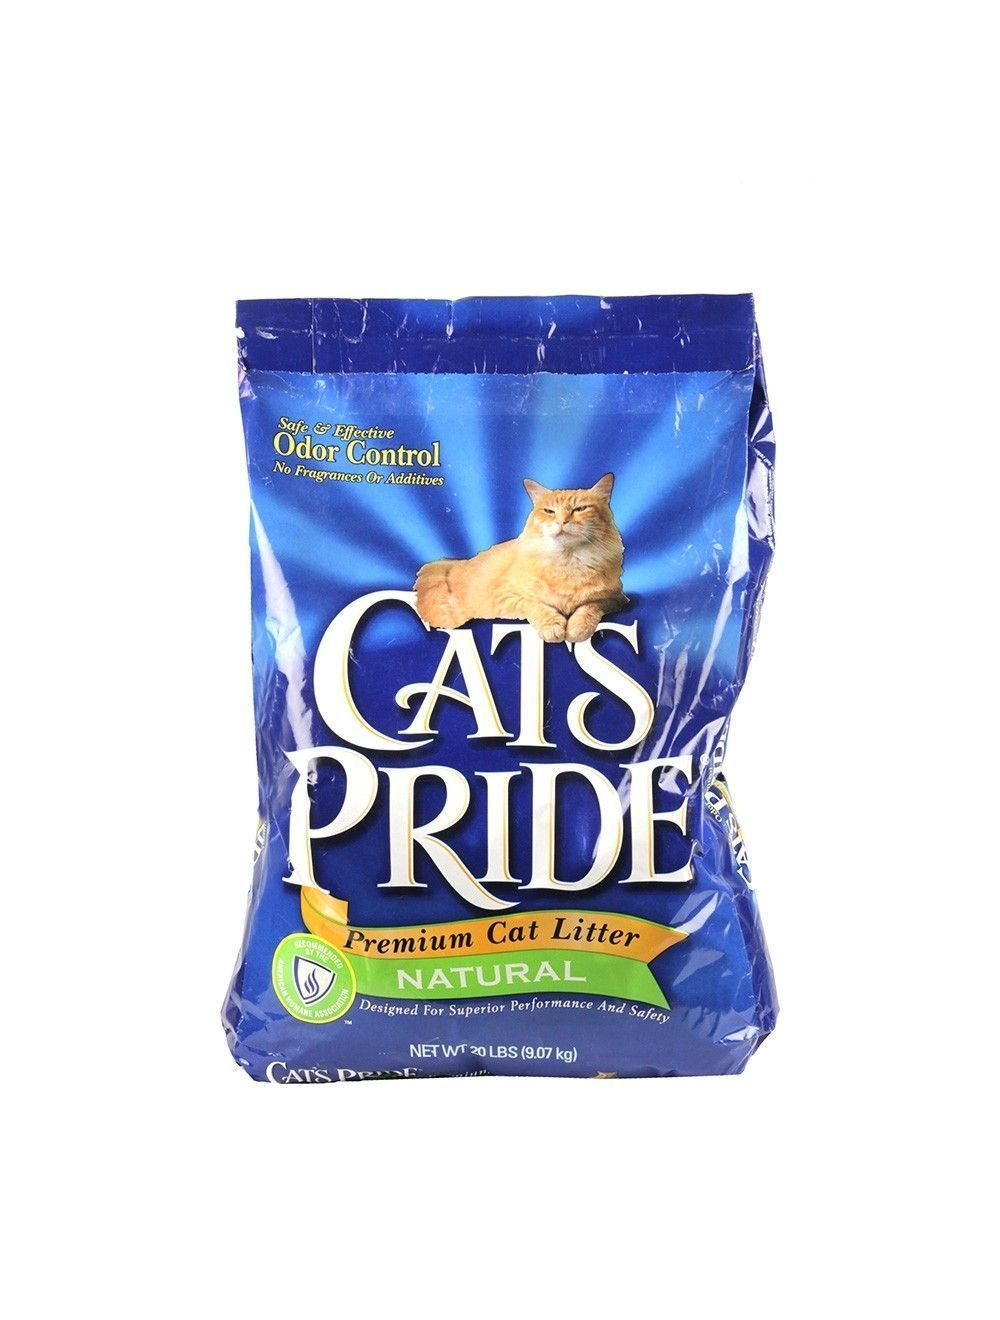 Cats Pride Premium Cat Litter Natural 4.5 Kg